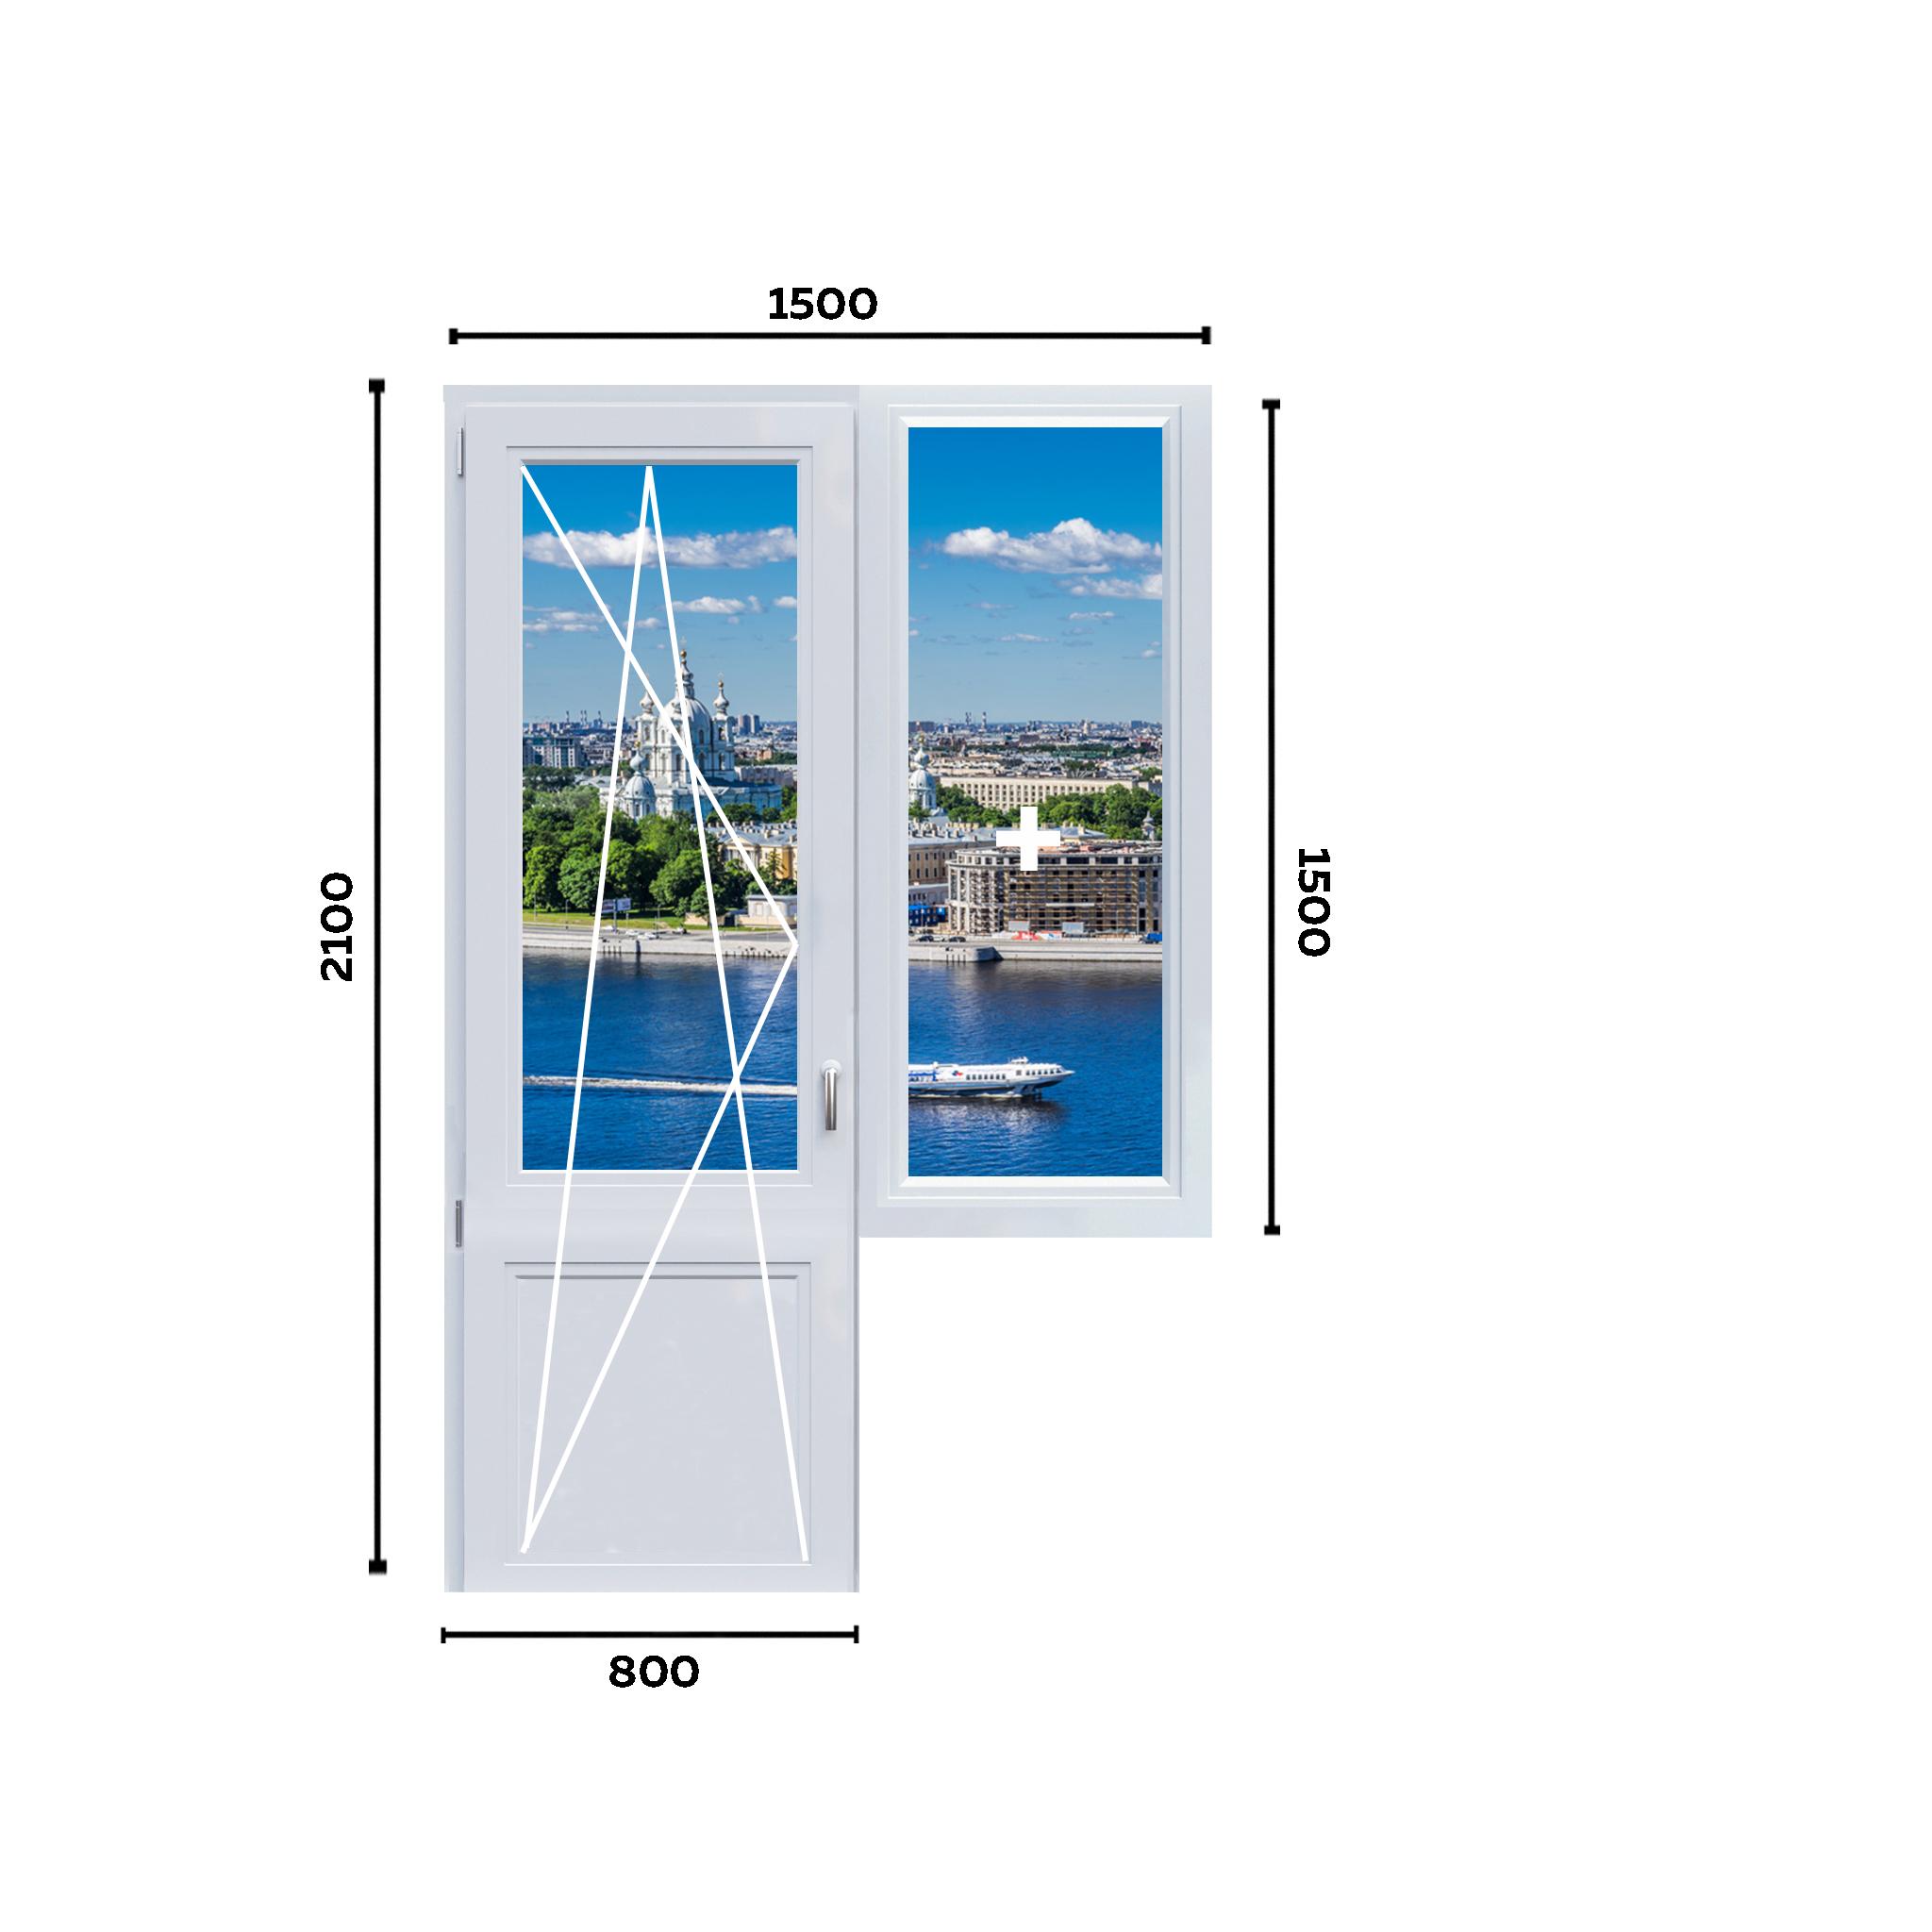 схема окна 1500мм вариант 2